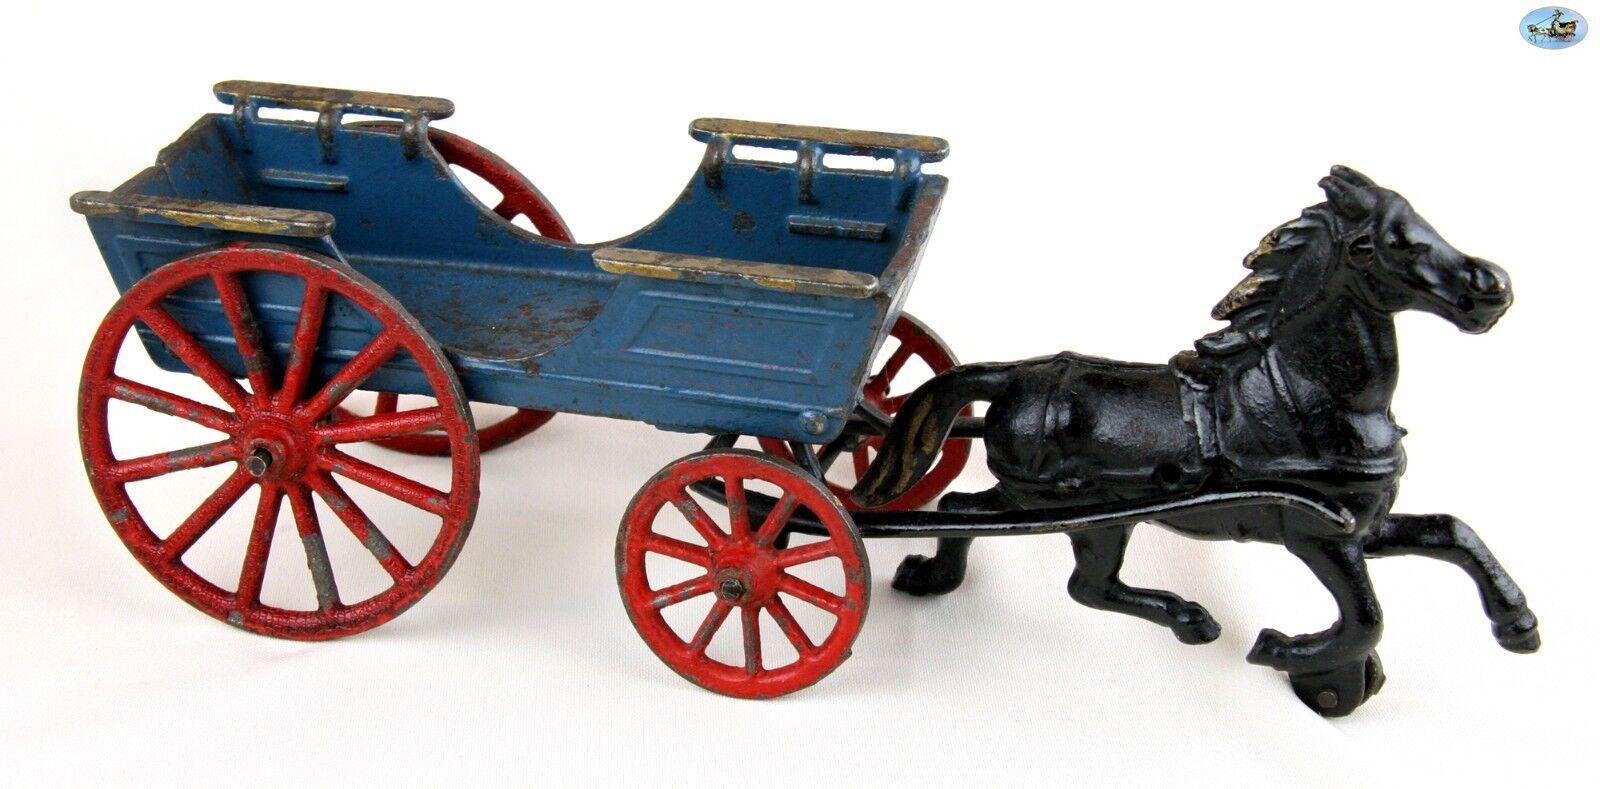 Fine Large Original Antique 1920 -talet Hubley Mfg. Co. Cast Iron Horse Transport